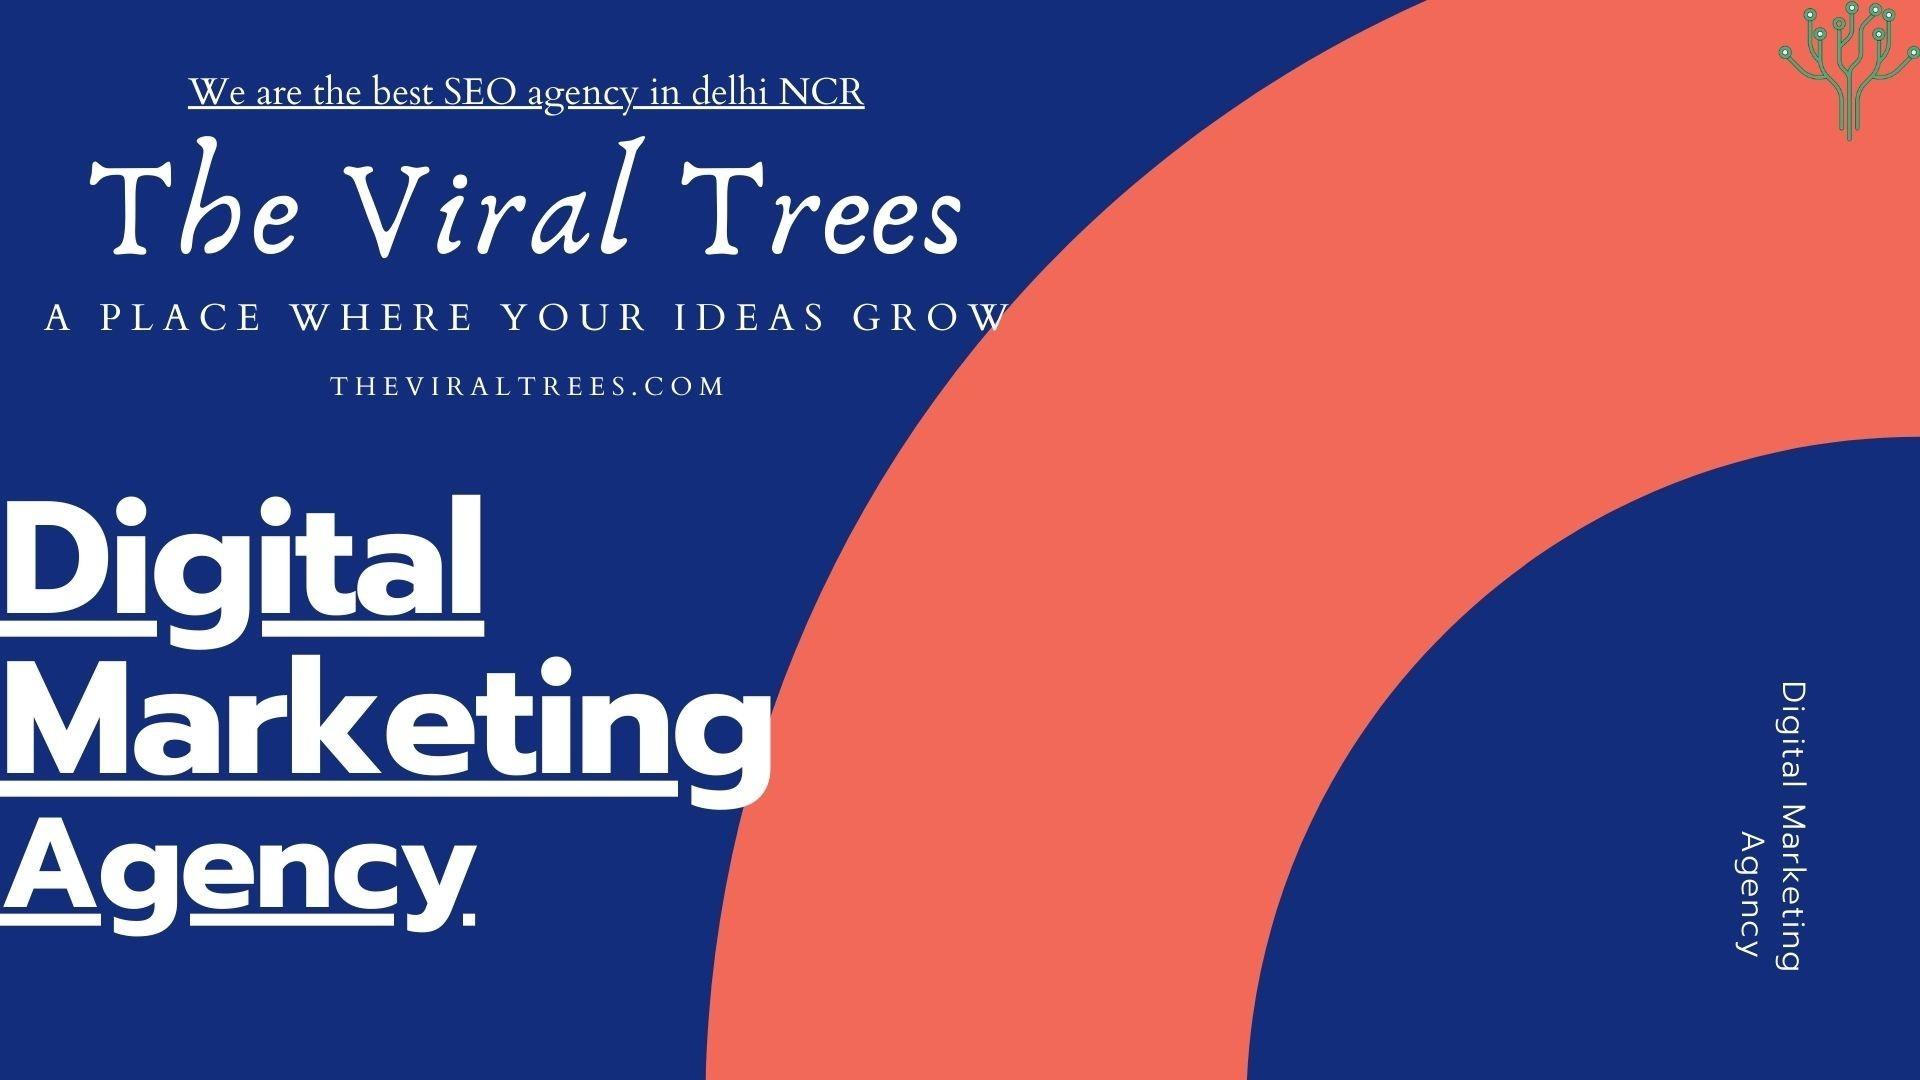 Best SEO agency in Delhi NCR | The Viral Trees